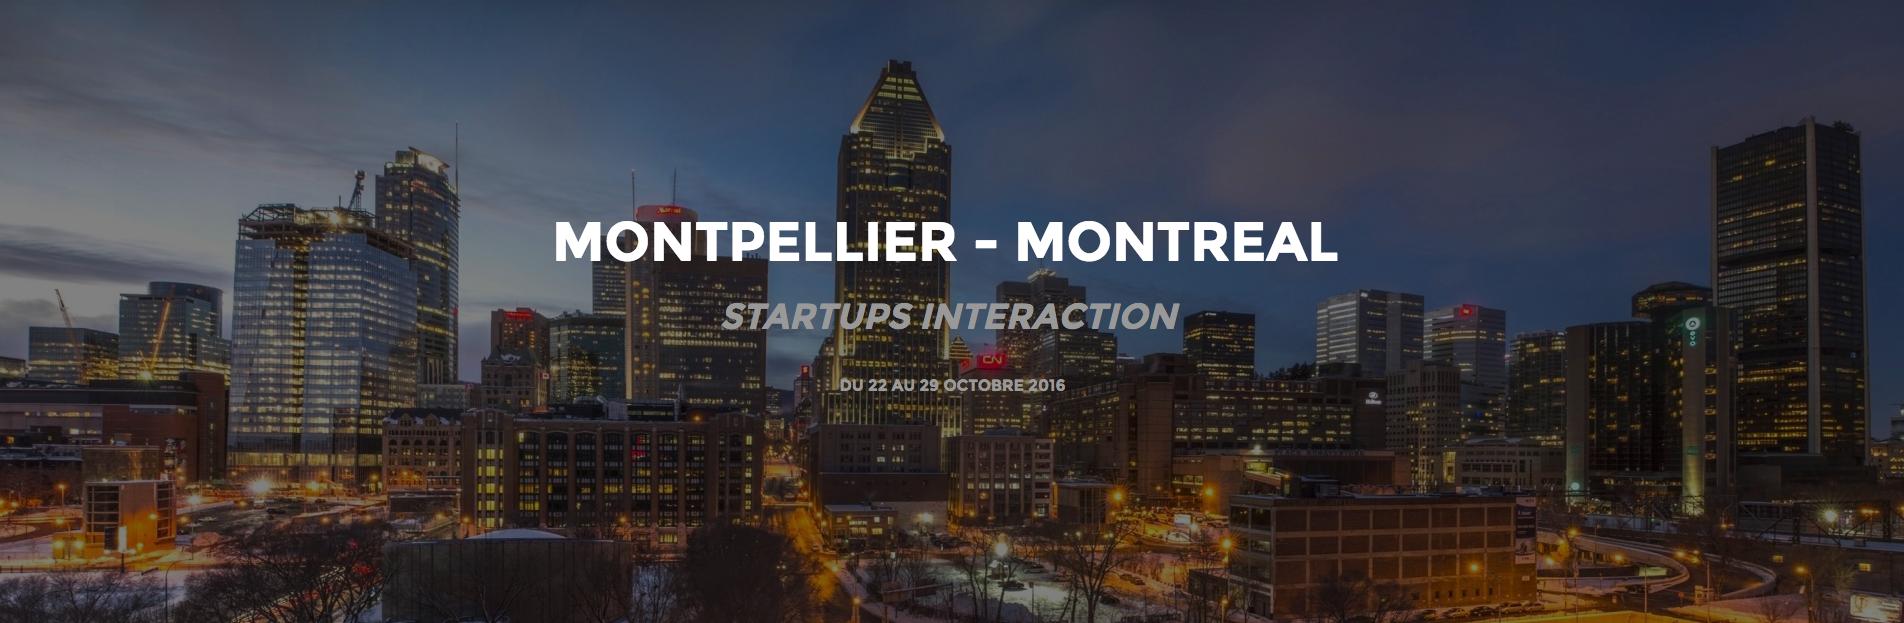 startup interaction Montpellier Montréal